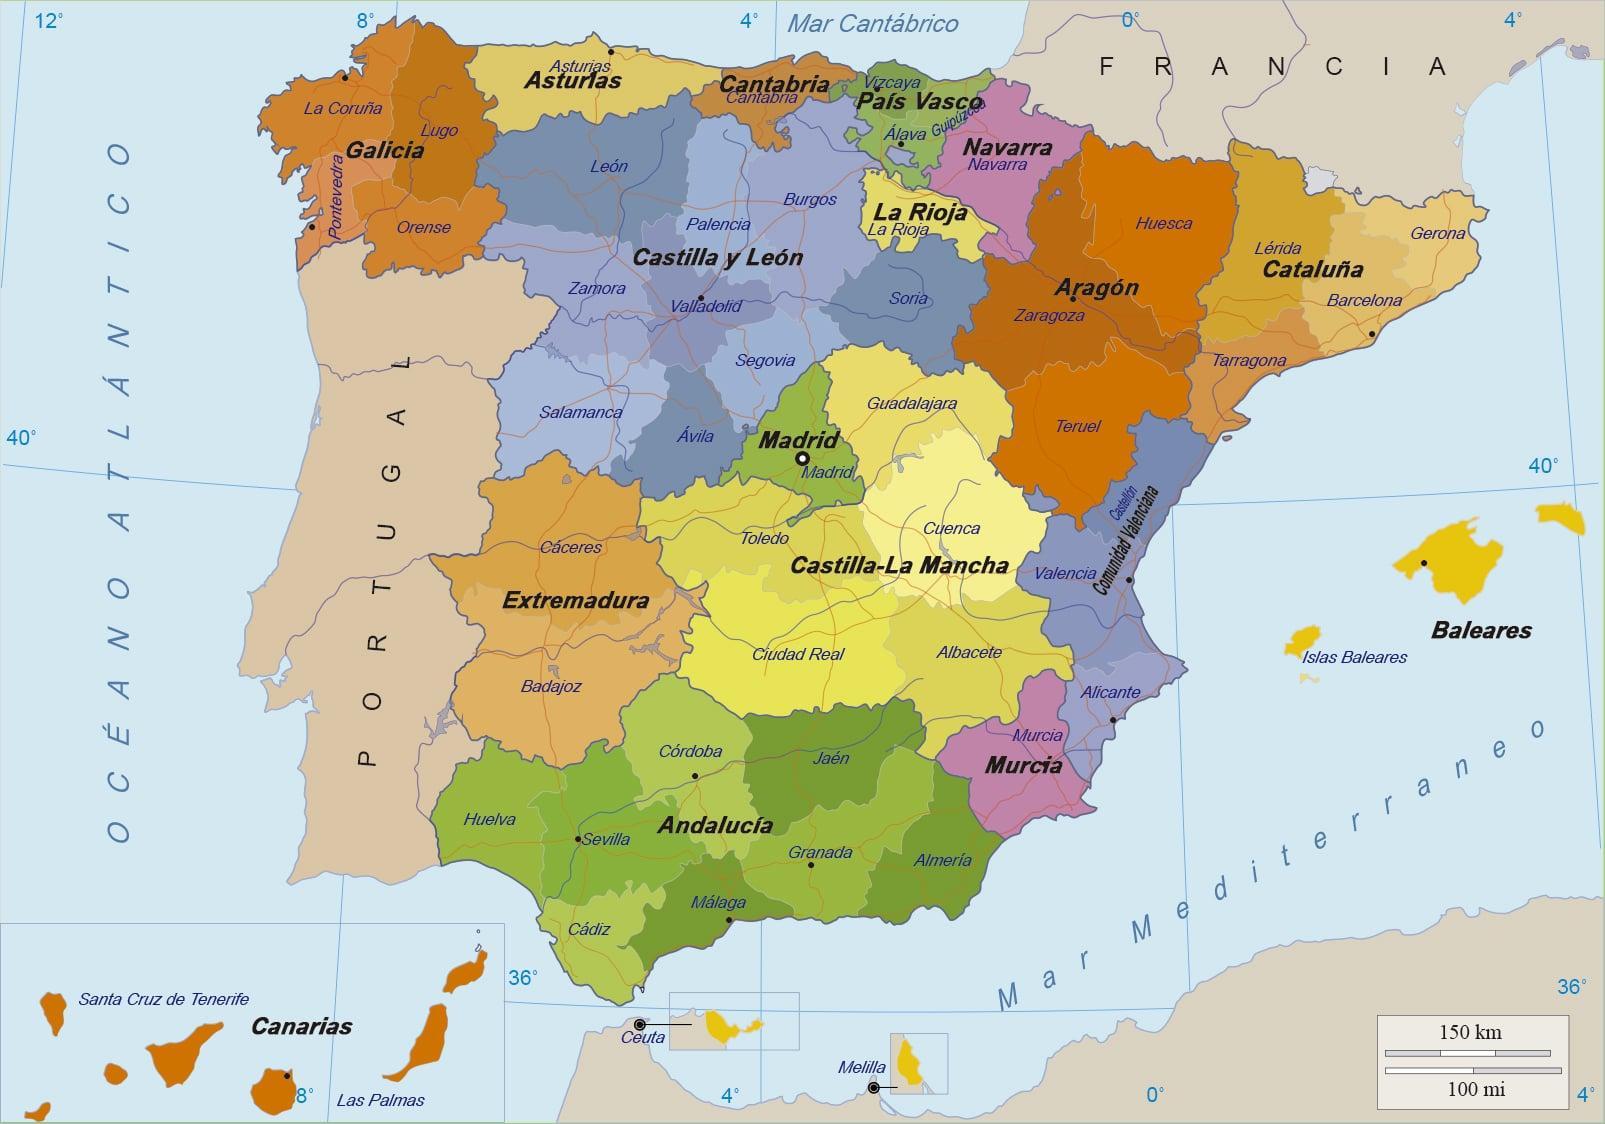 Karta Pa Spansk.Karta Over Spanien Och Oarna Karta Over Spanien Och Dess Oar